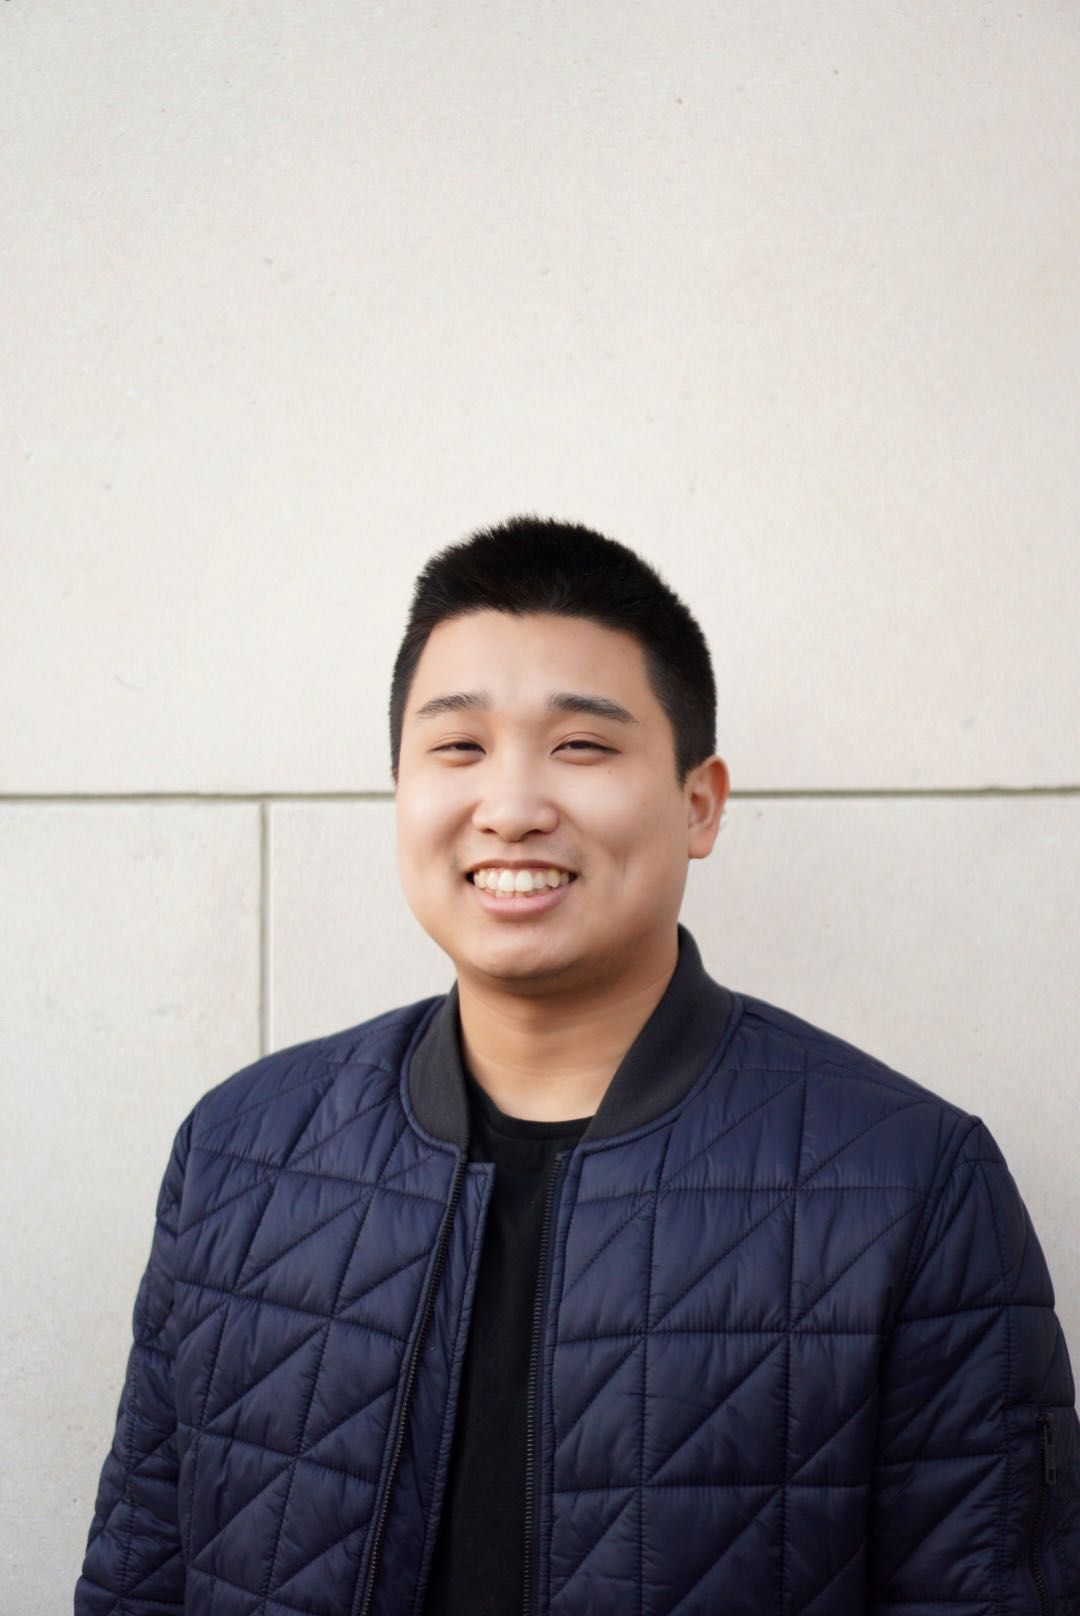 Lawrence Hung